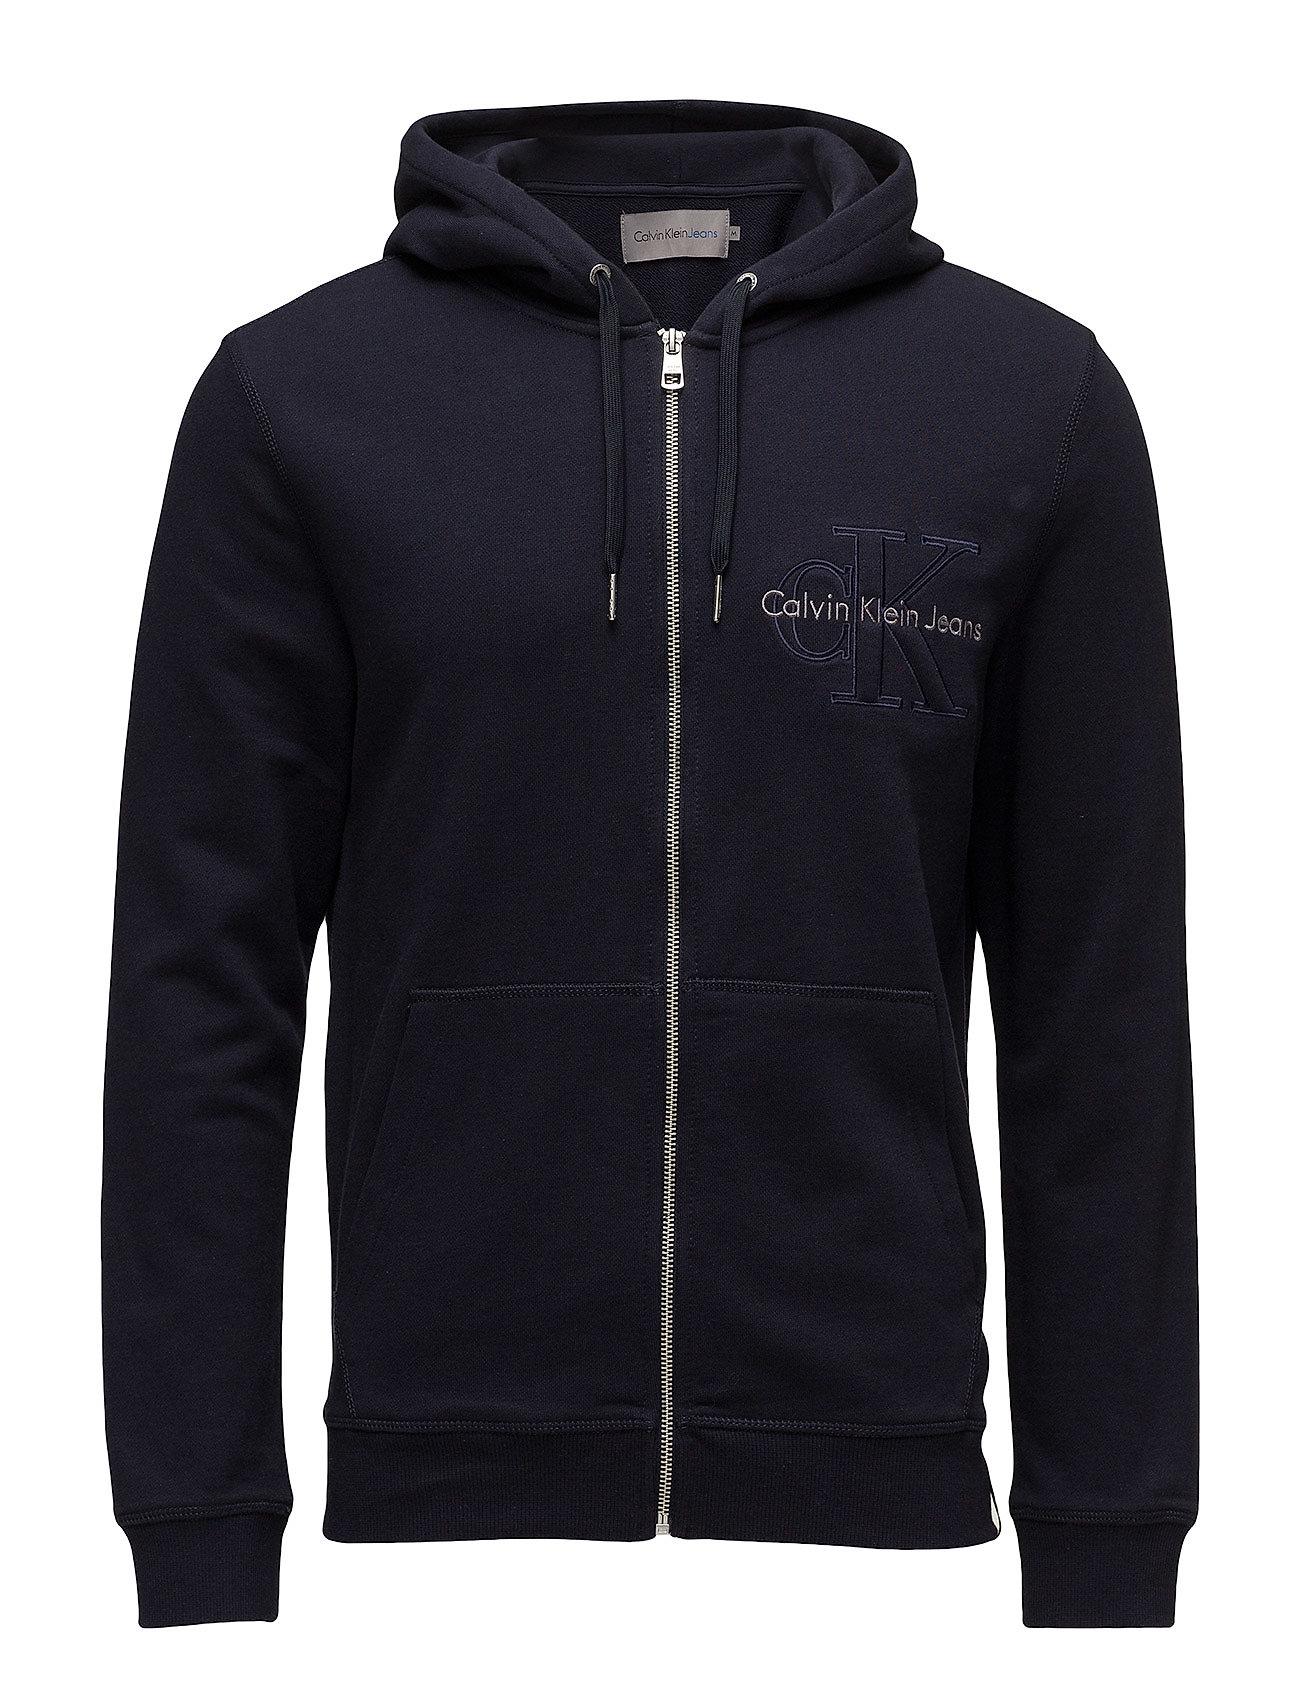 calvin klein jeans – Hasto 2 slim hoodie, fra boozt.com dk